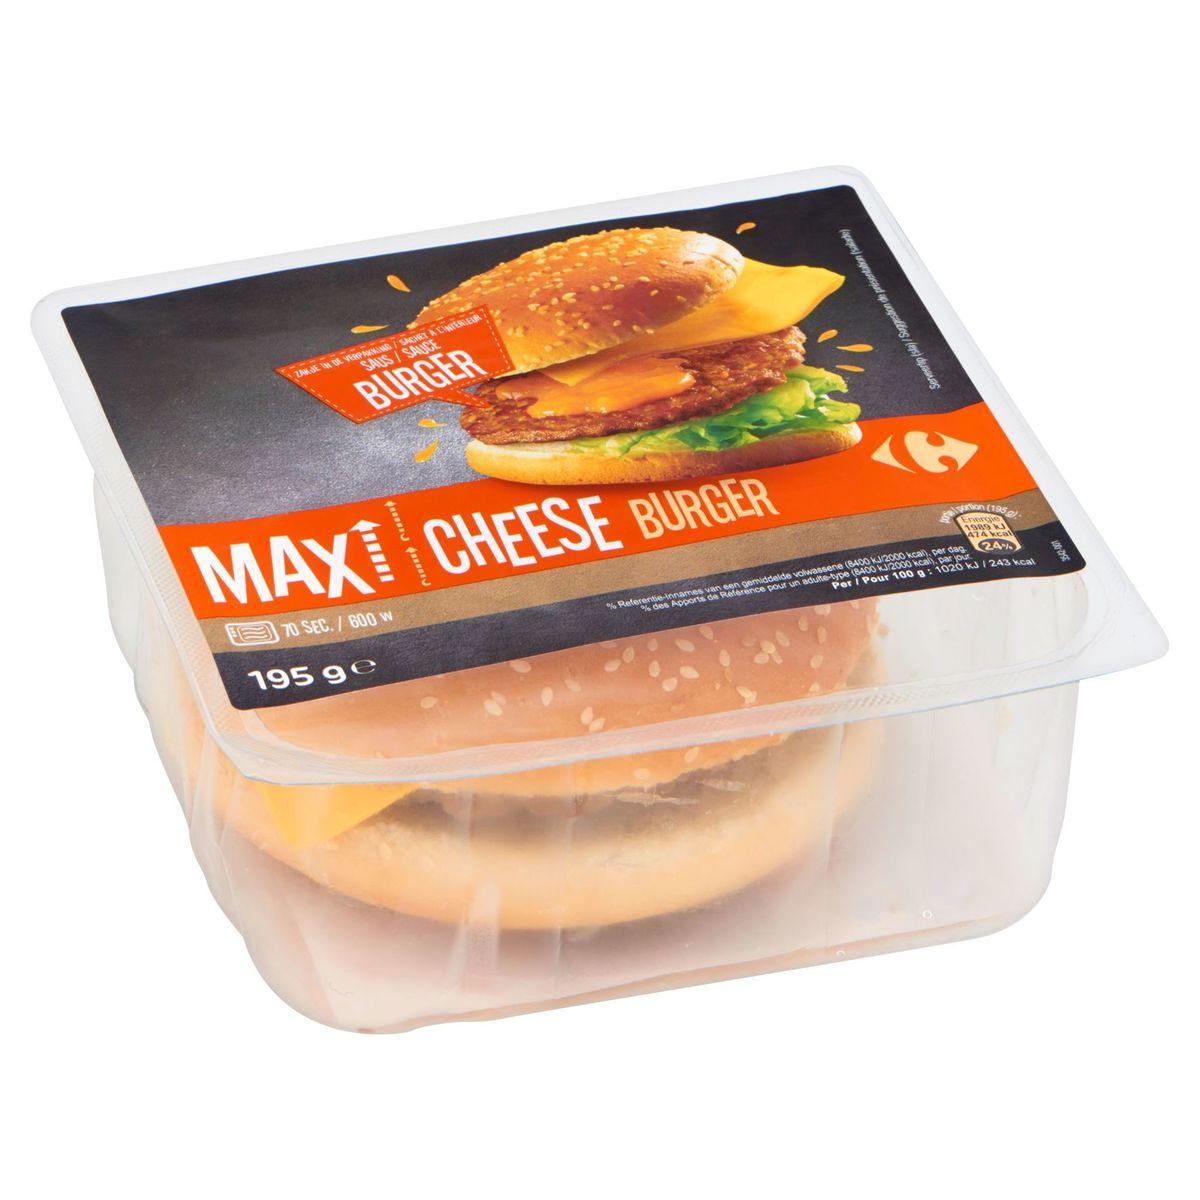 Carrefour Max Cheese Burger 195 g